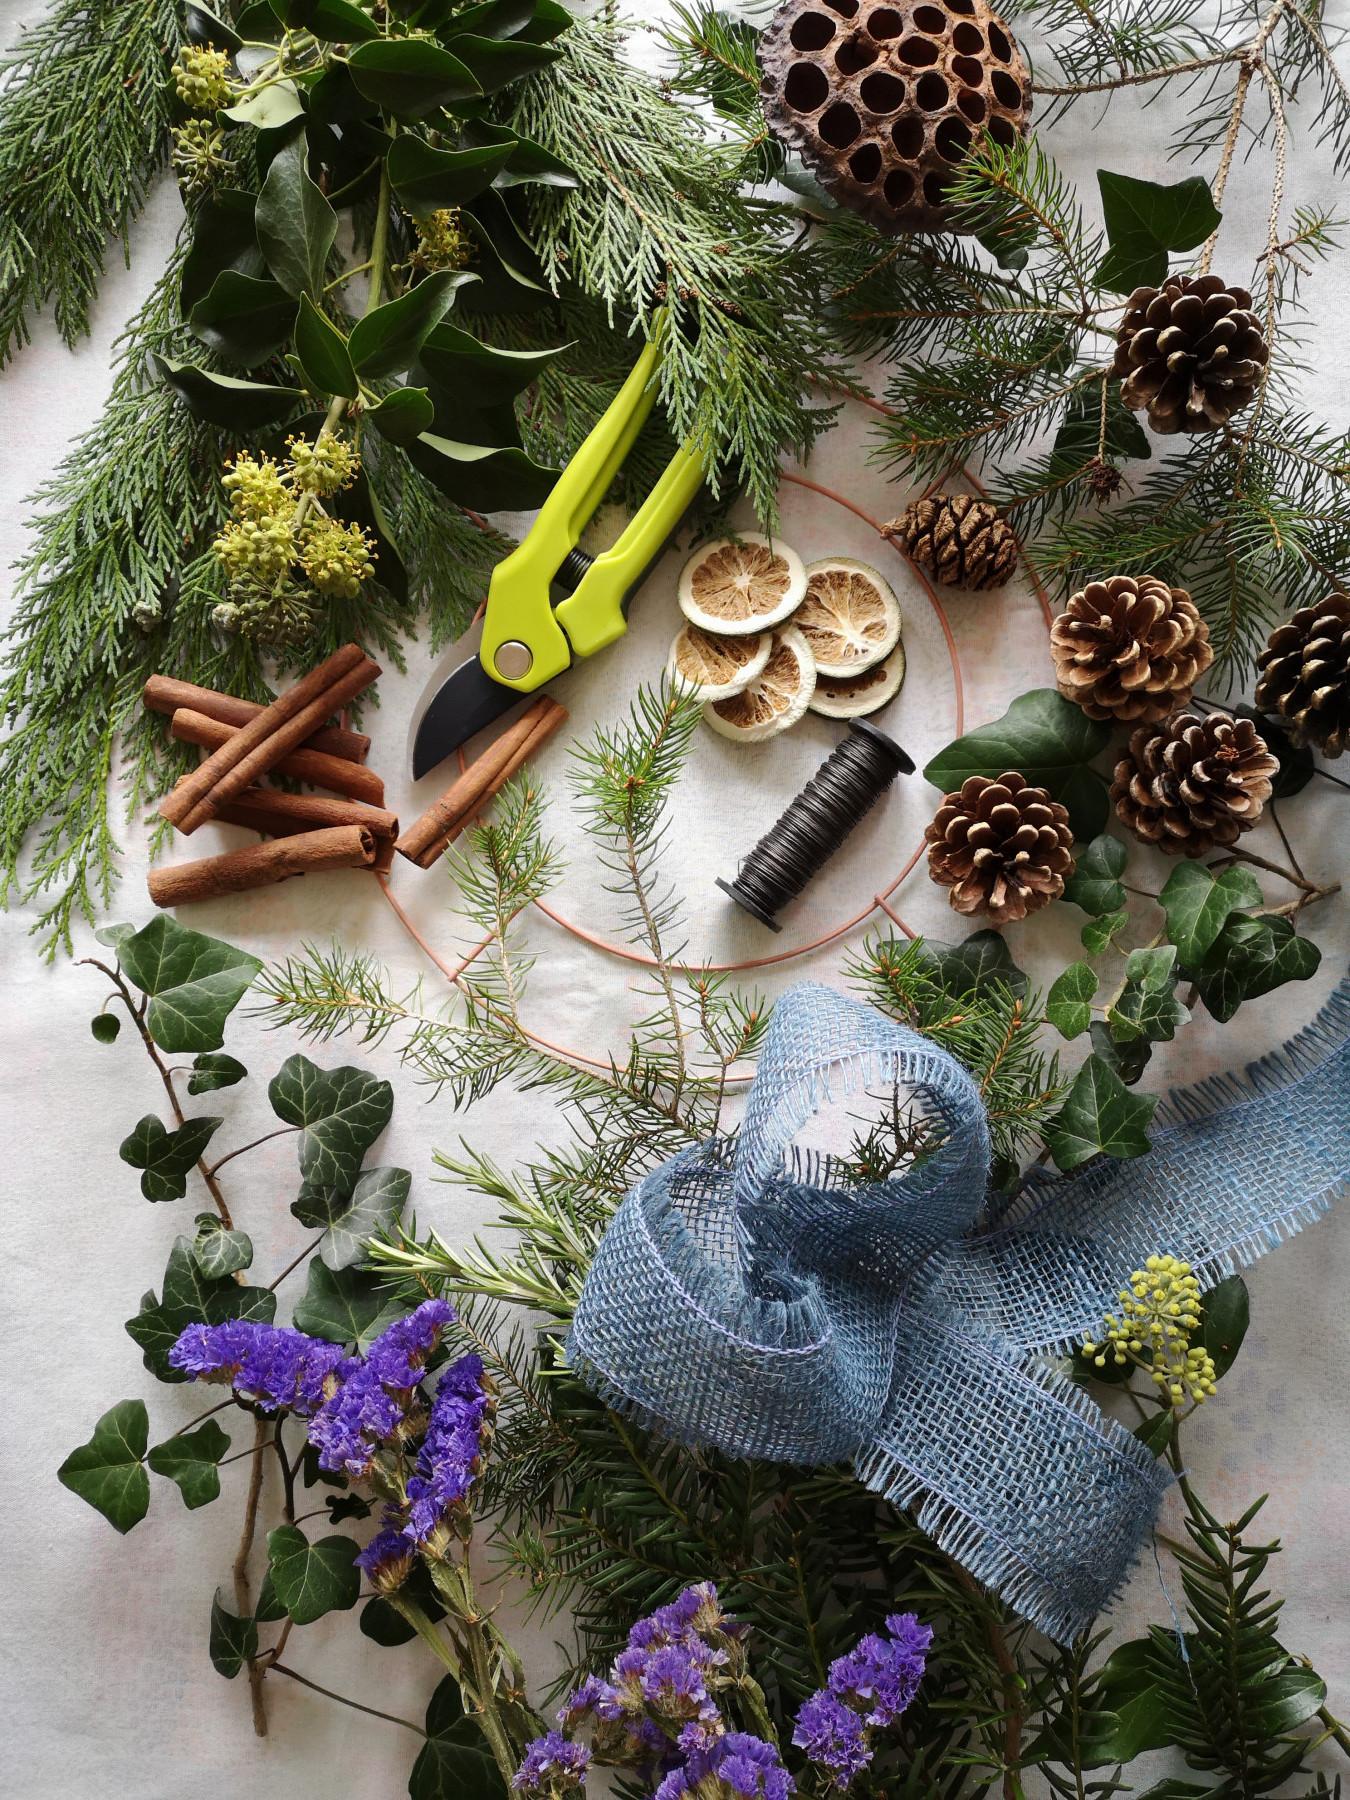 Festive Wreath Workshops